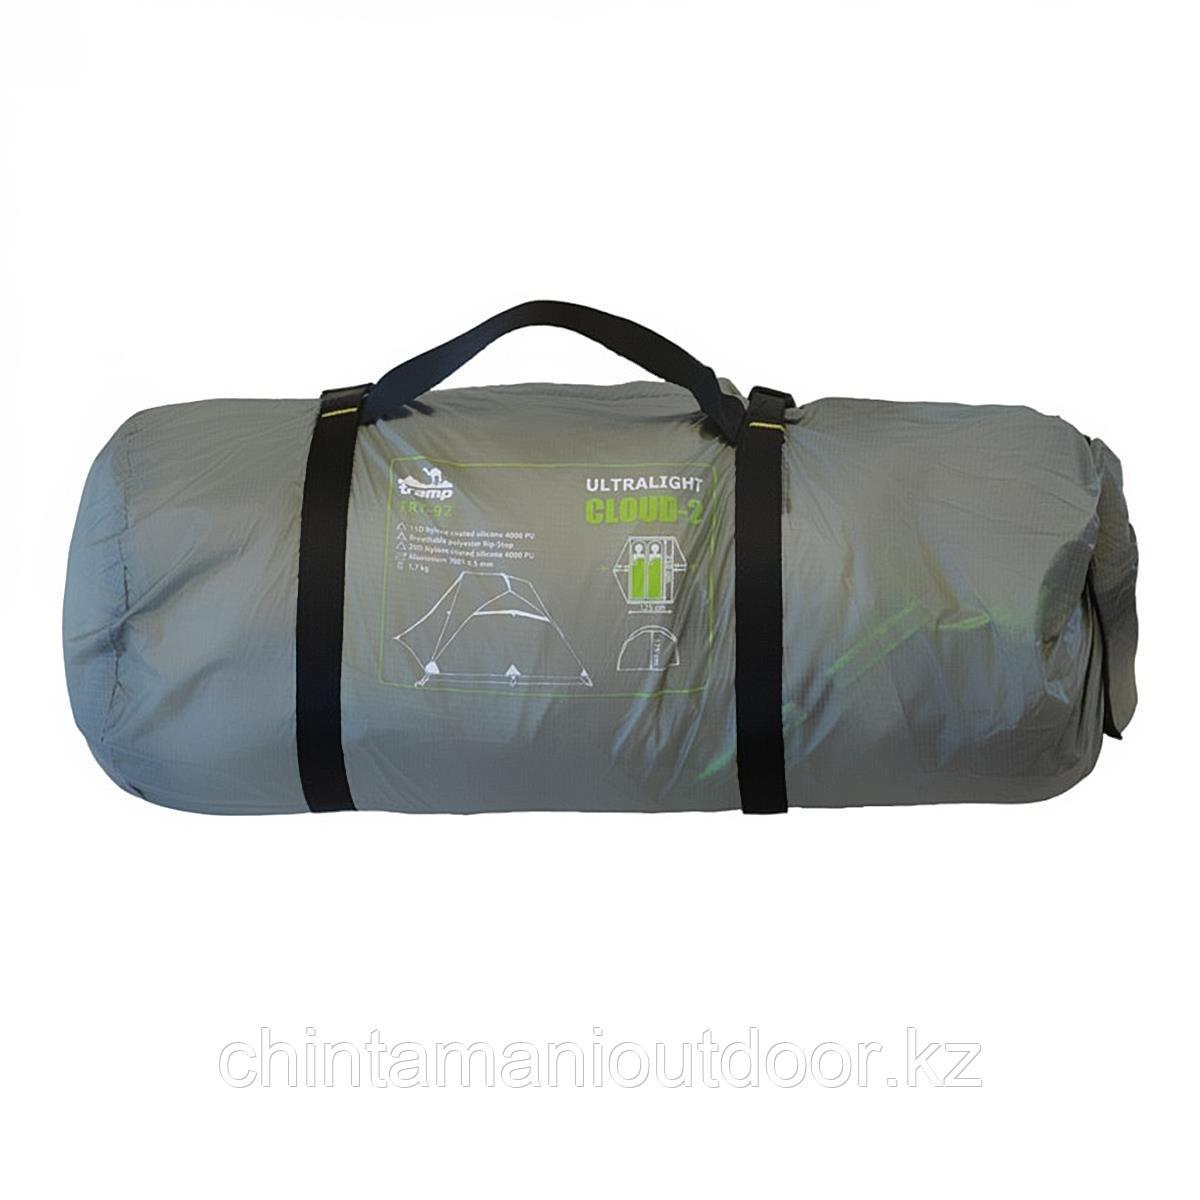 Ультралегкая палатка 2х местная, Tramp Сloud 2 Si, вес 2,15 кг, тамбур - фото 7